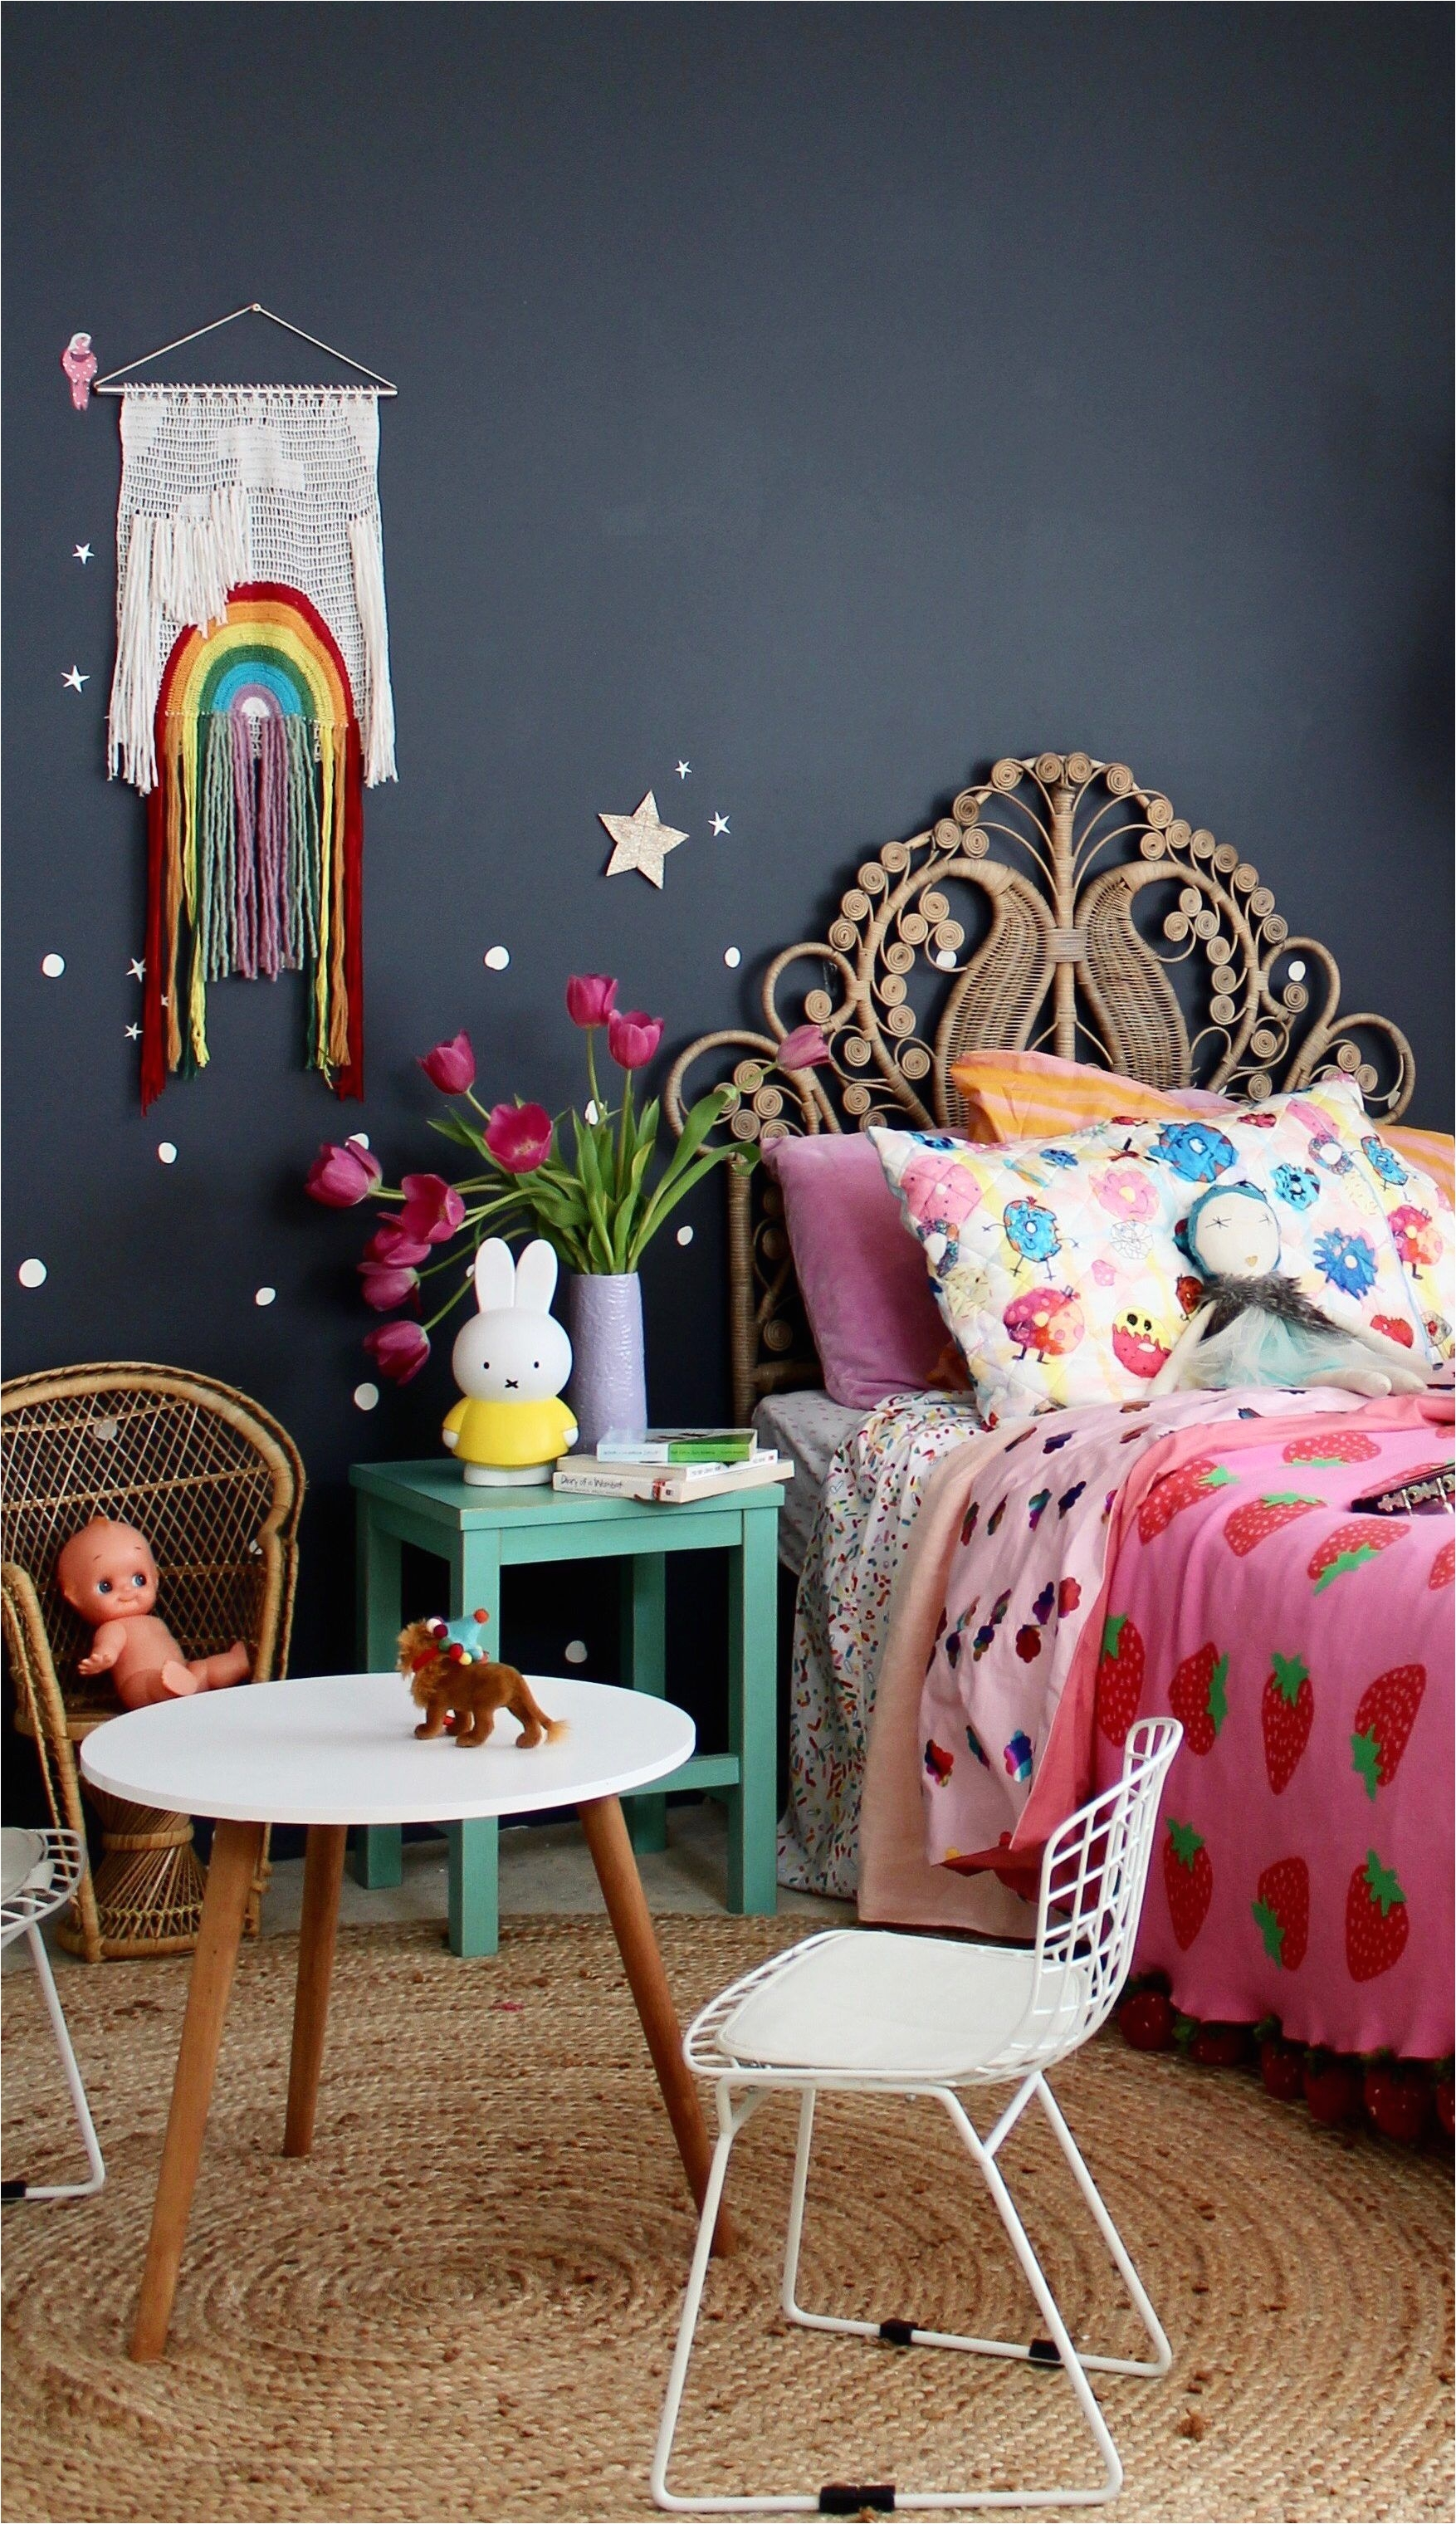 Teenage Chairs for Bedrooms Australia Trending now Boho Vintage Mini Rooms Pinterest Boho